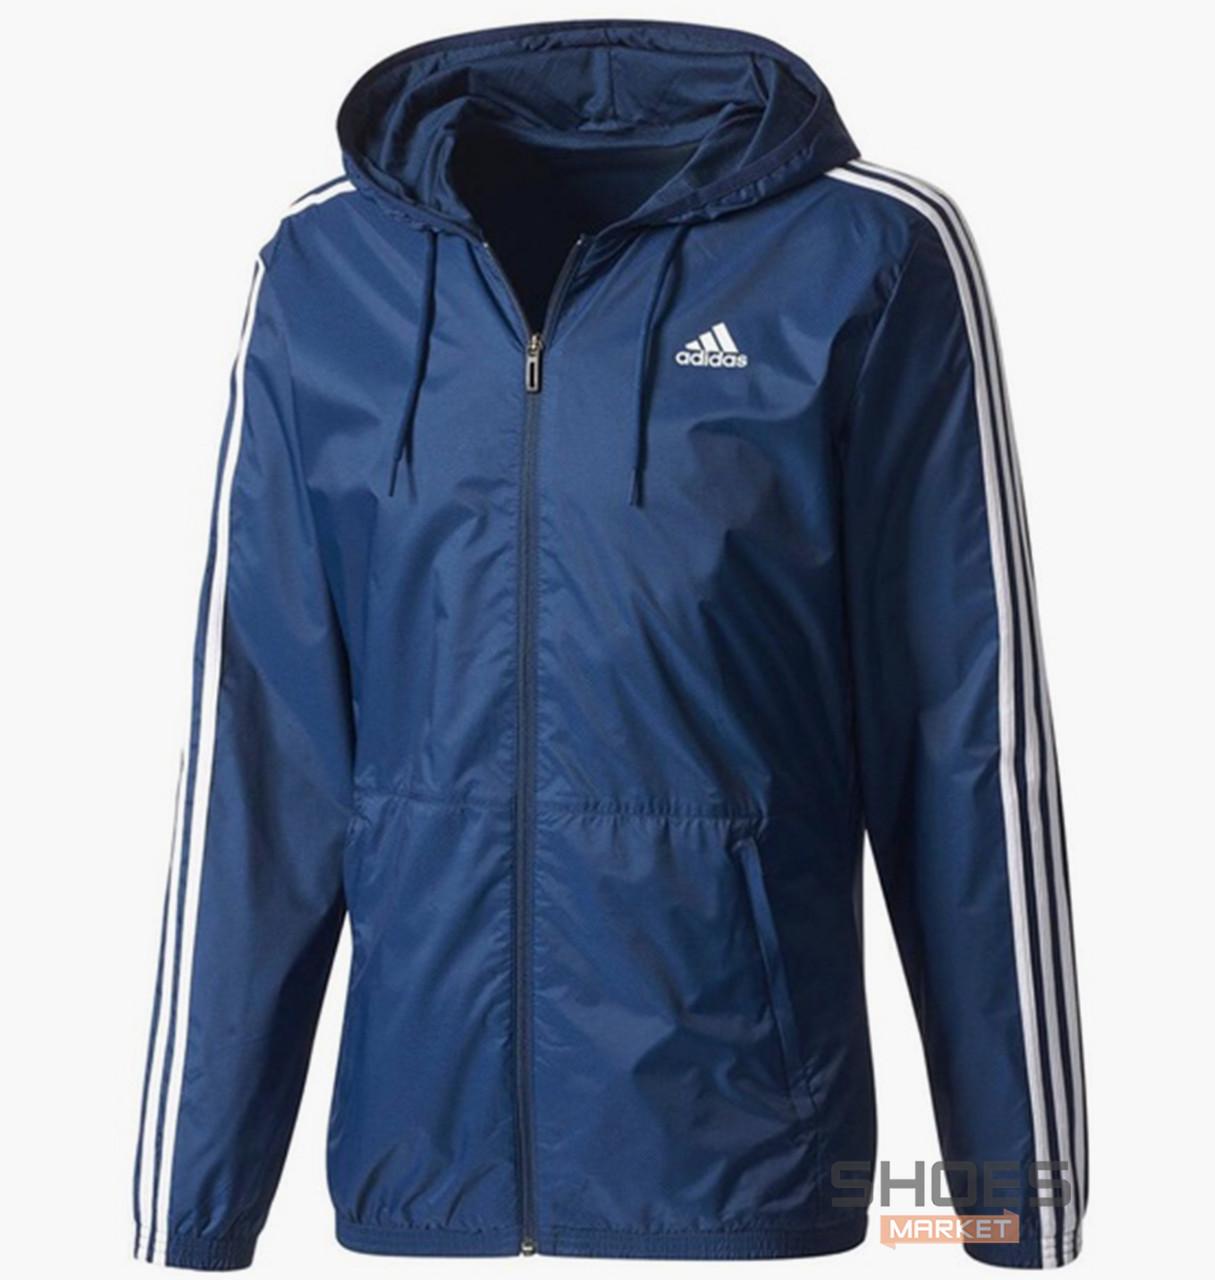 Олимпийка Adidas Navy CD9151, оригинал